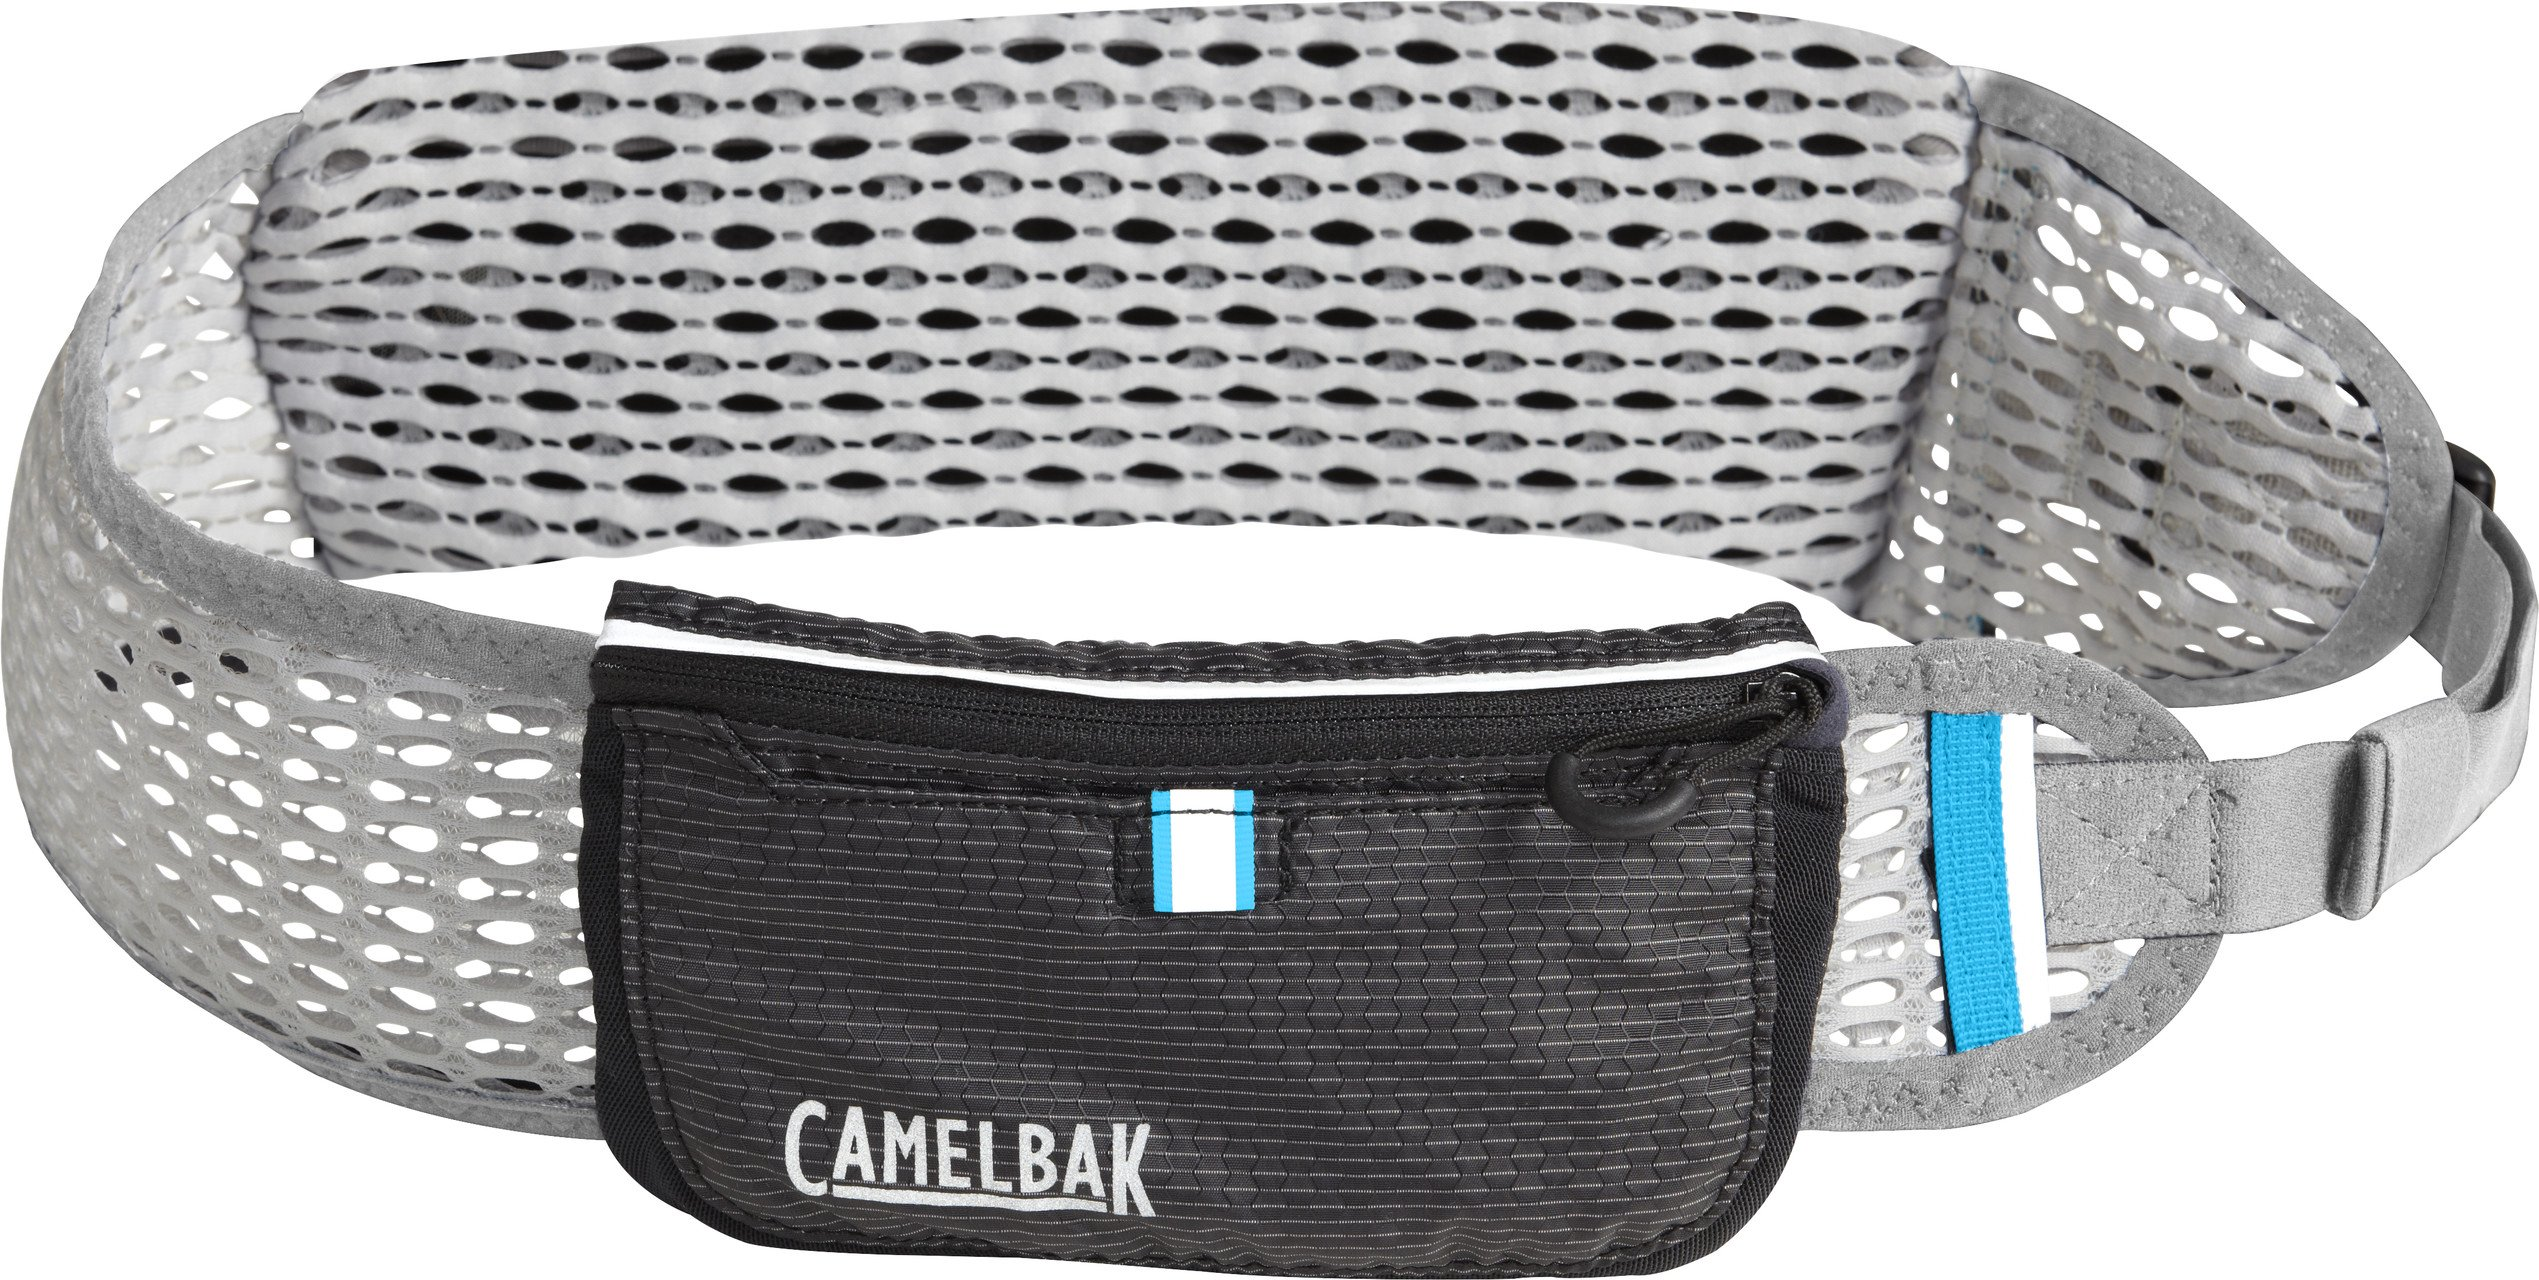 CamelBak Ultra Hydration Silver X Small